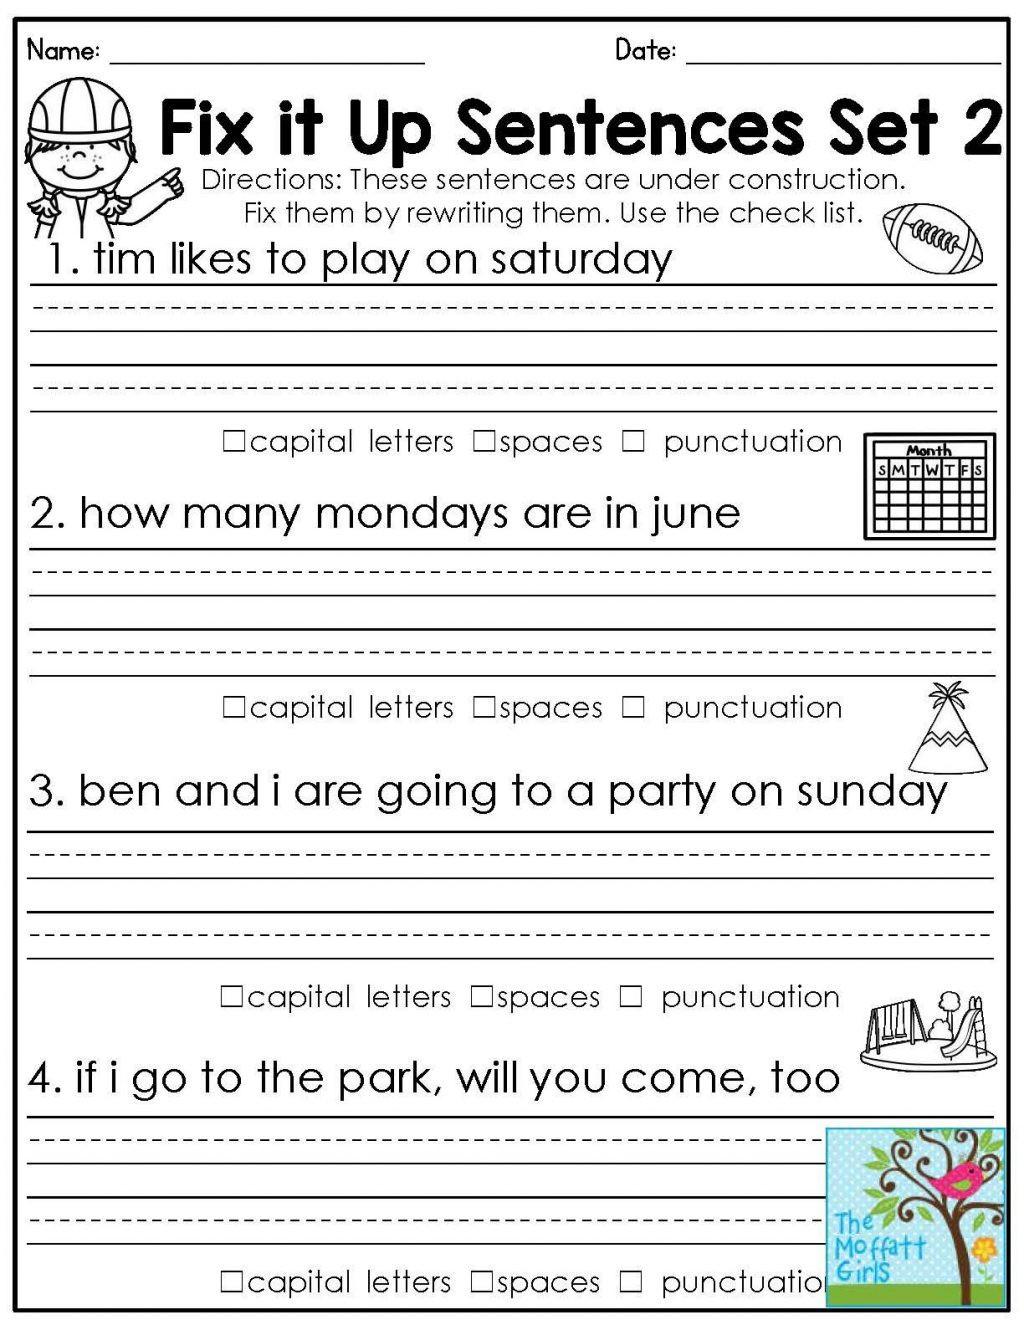 Third Grade Grammar Worksheets 4 Free Grammar Worksheets Third Grade 3 Capitalization